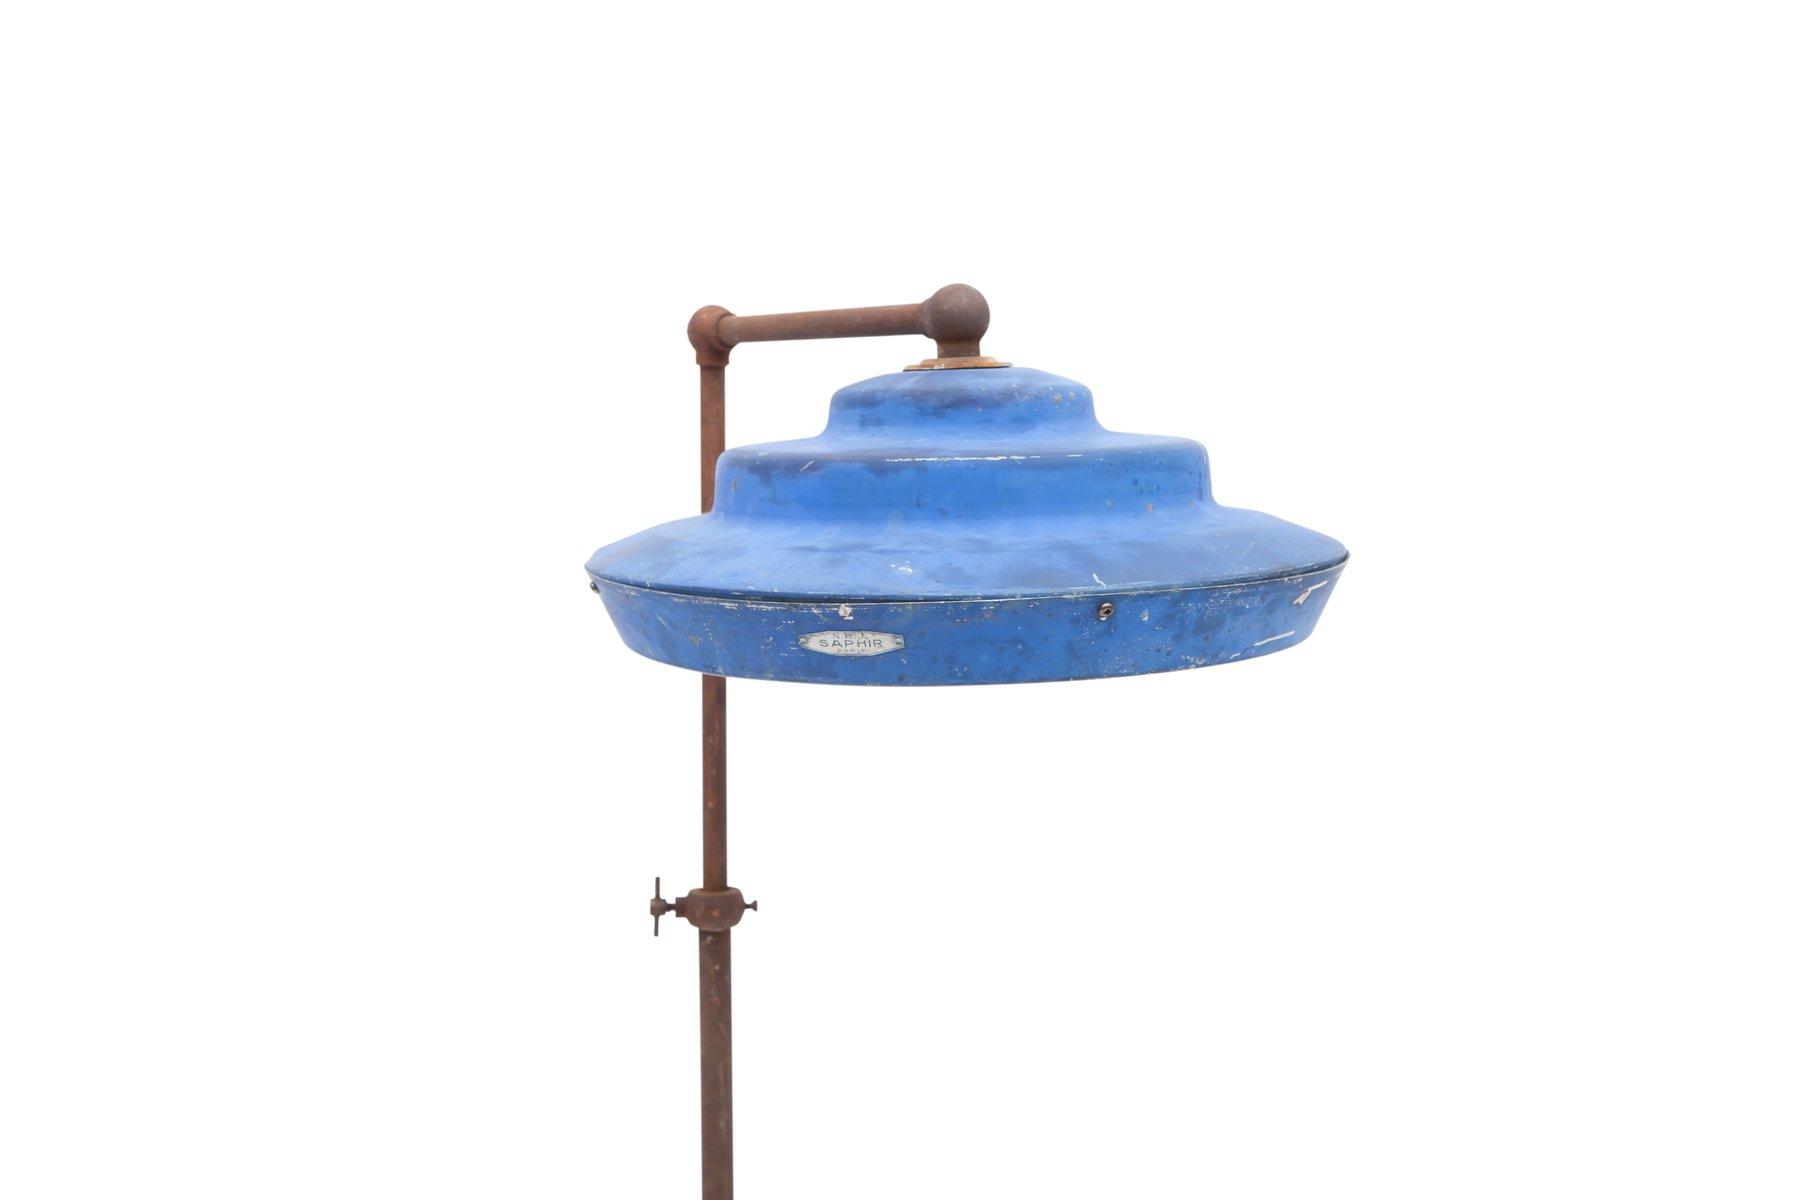 antique industrial floor lamp from saphir paris for sale at pamono. Black Bedroom Furniture Sets. Home Design Ideas